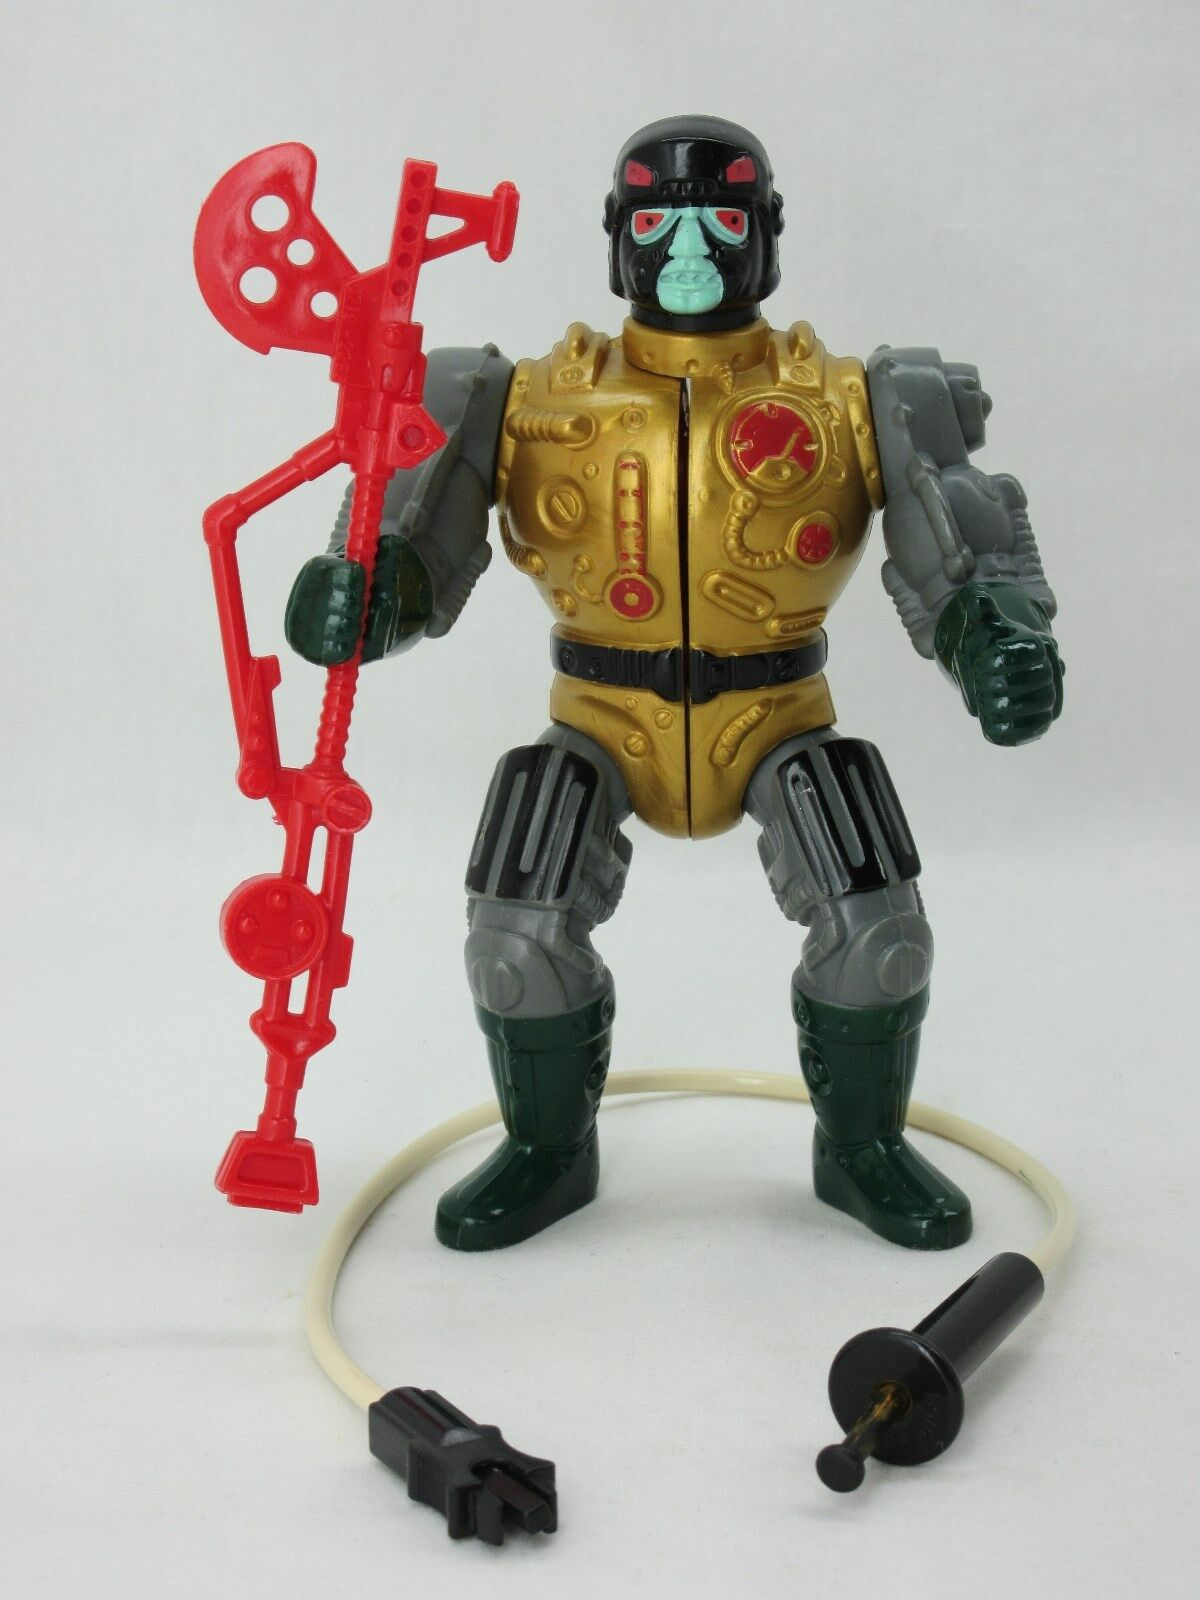 MOTU,Vintage,BLAST-ATTAK,Masters of the Universe,figure,100% complete,he man